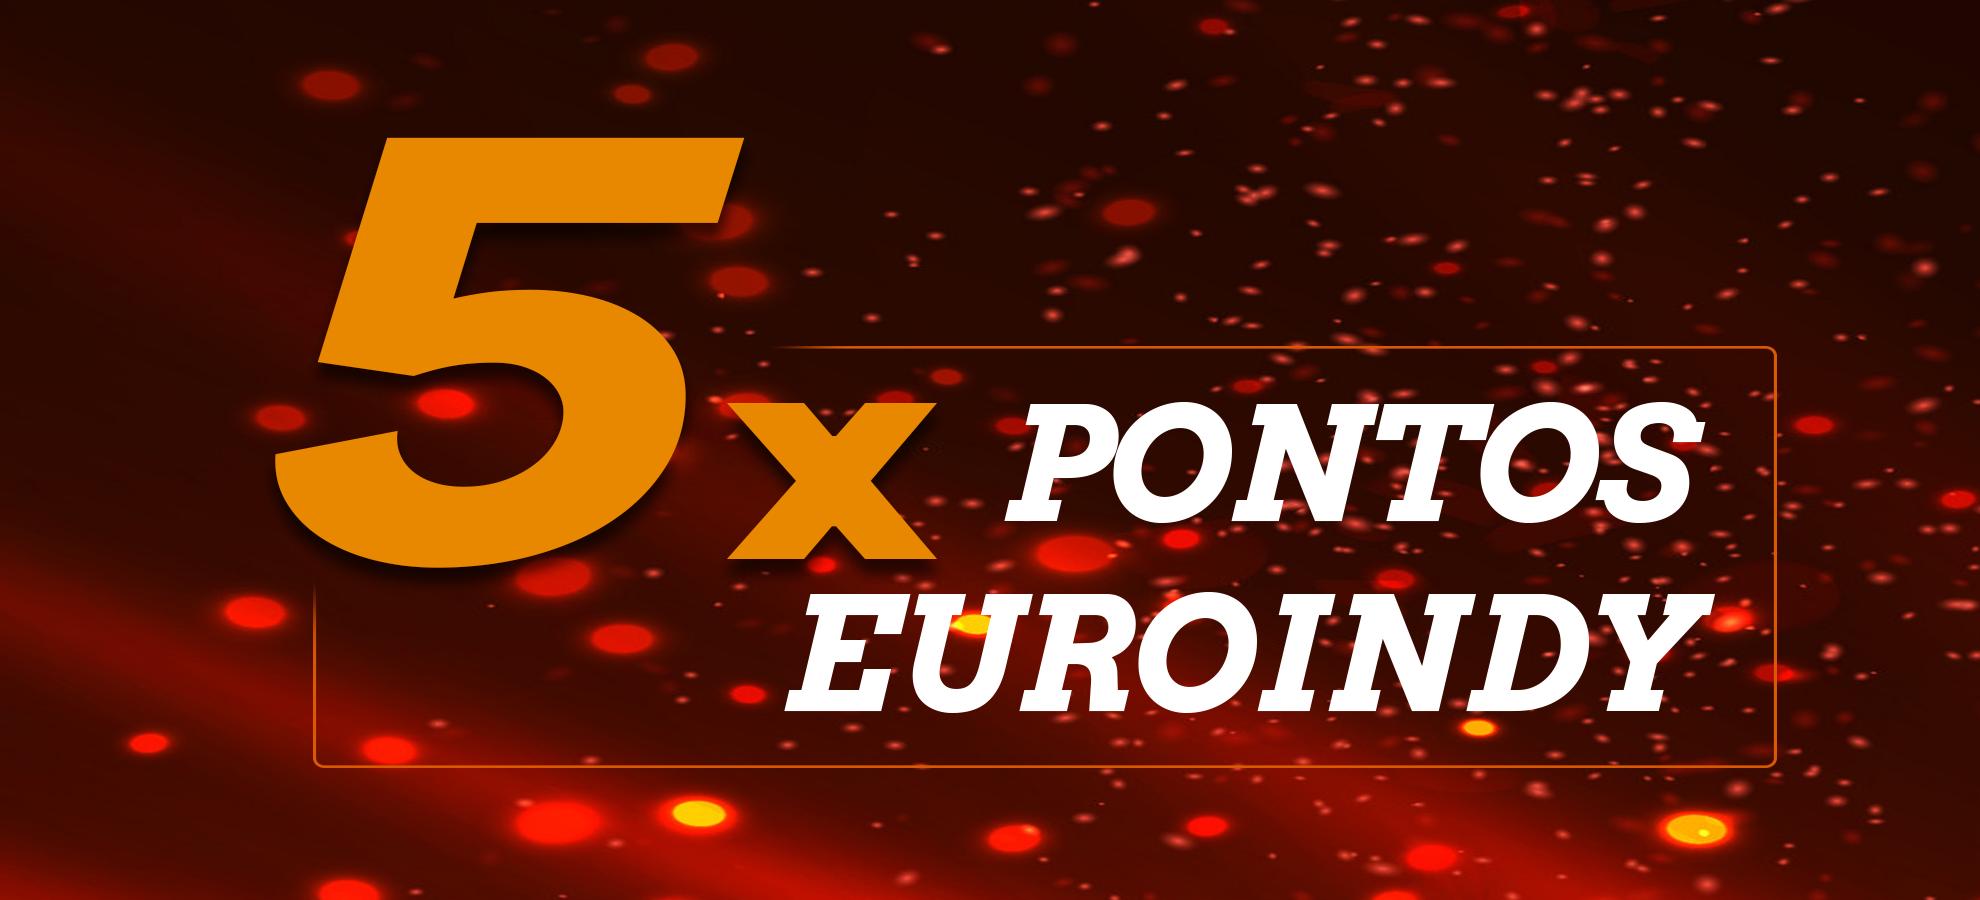 Pontos Euroindy